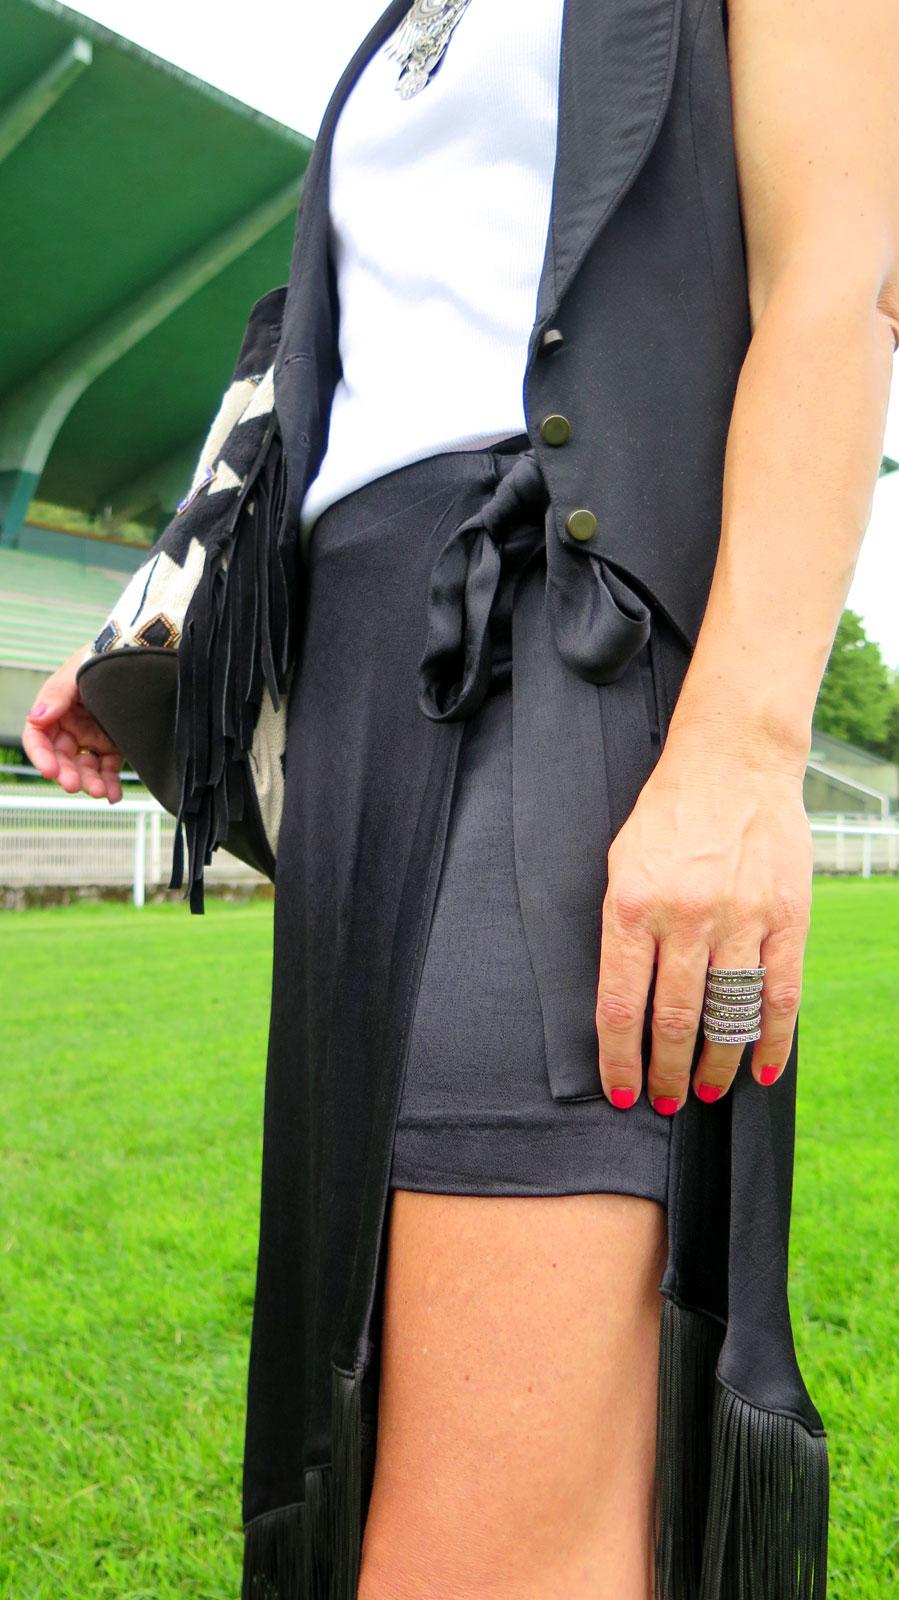 Rebeca Valdivia, asesora de imagen, personal shopper, influencer, Donostia, San Sebastián, Miss Clov, la blogger indie, Lasarte, falda, flechos, skirt, frills, cowboy boots, cowgirl, botas, chaleco, vest, indie, rizos, curls